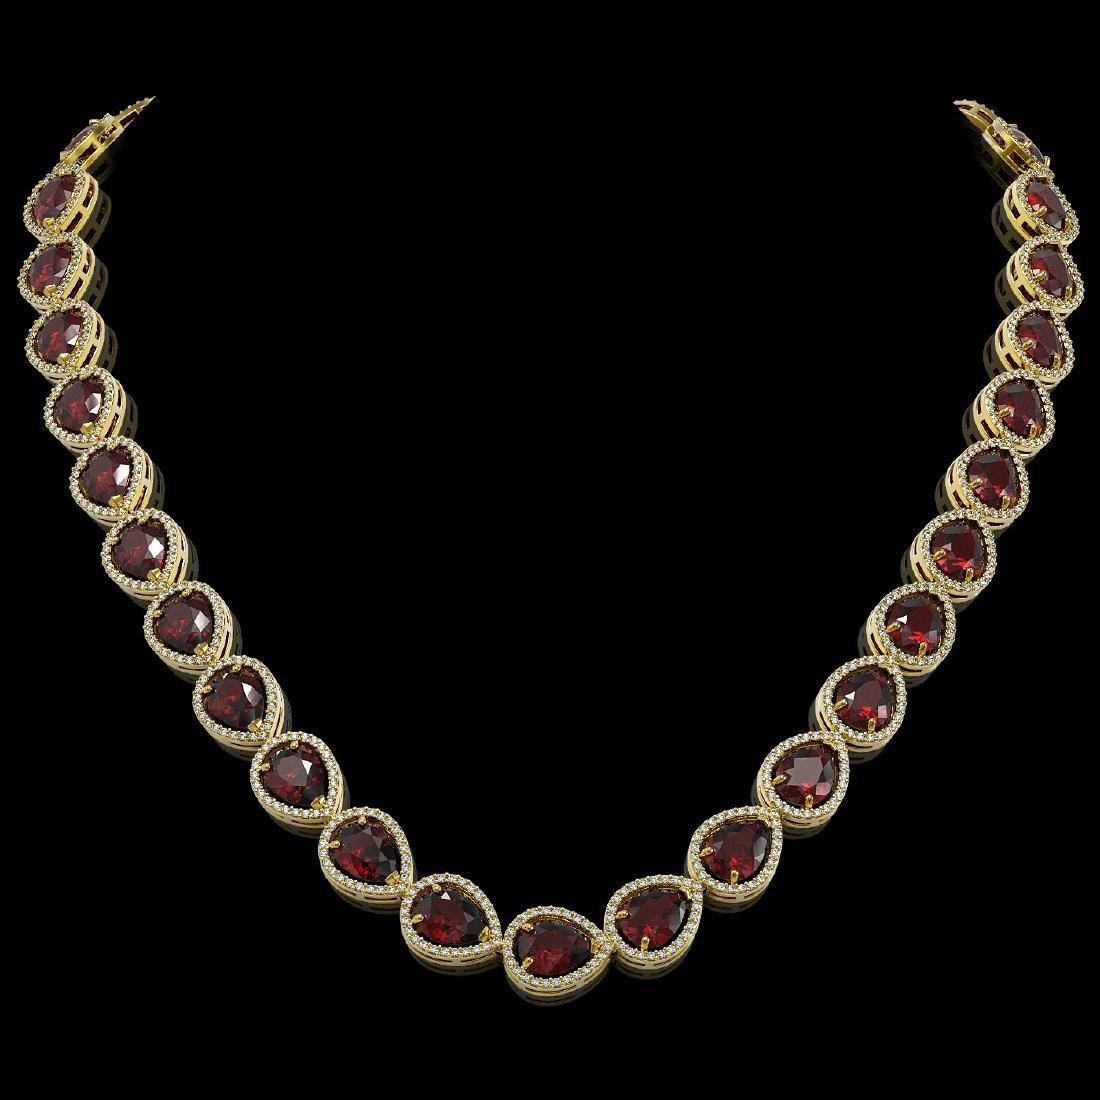 36.8 CTW Garnet & Diamond Halo Necklace 10K Yellow Gold